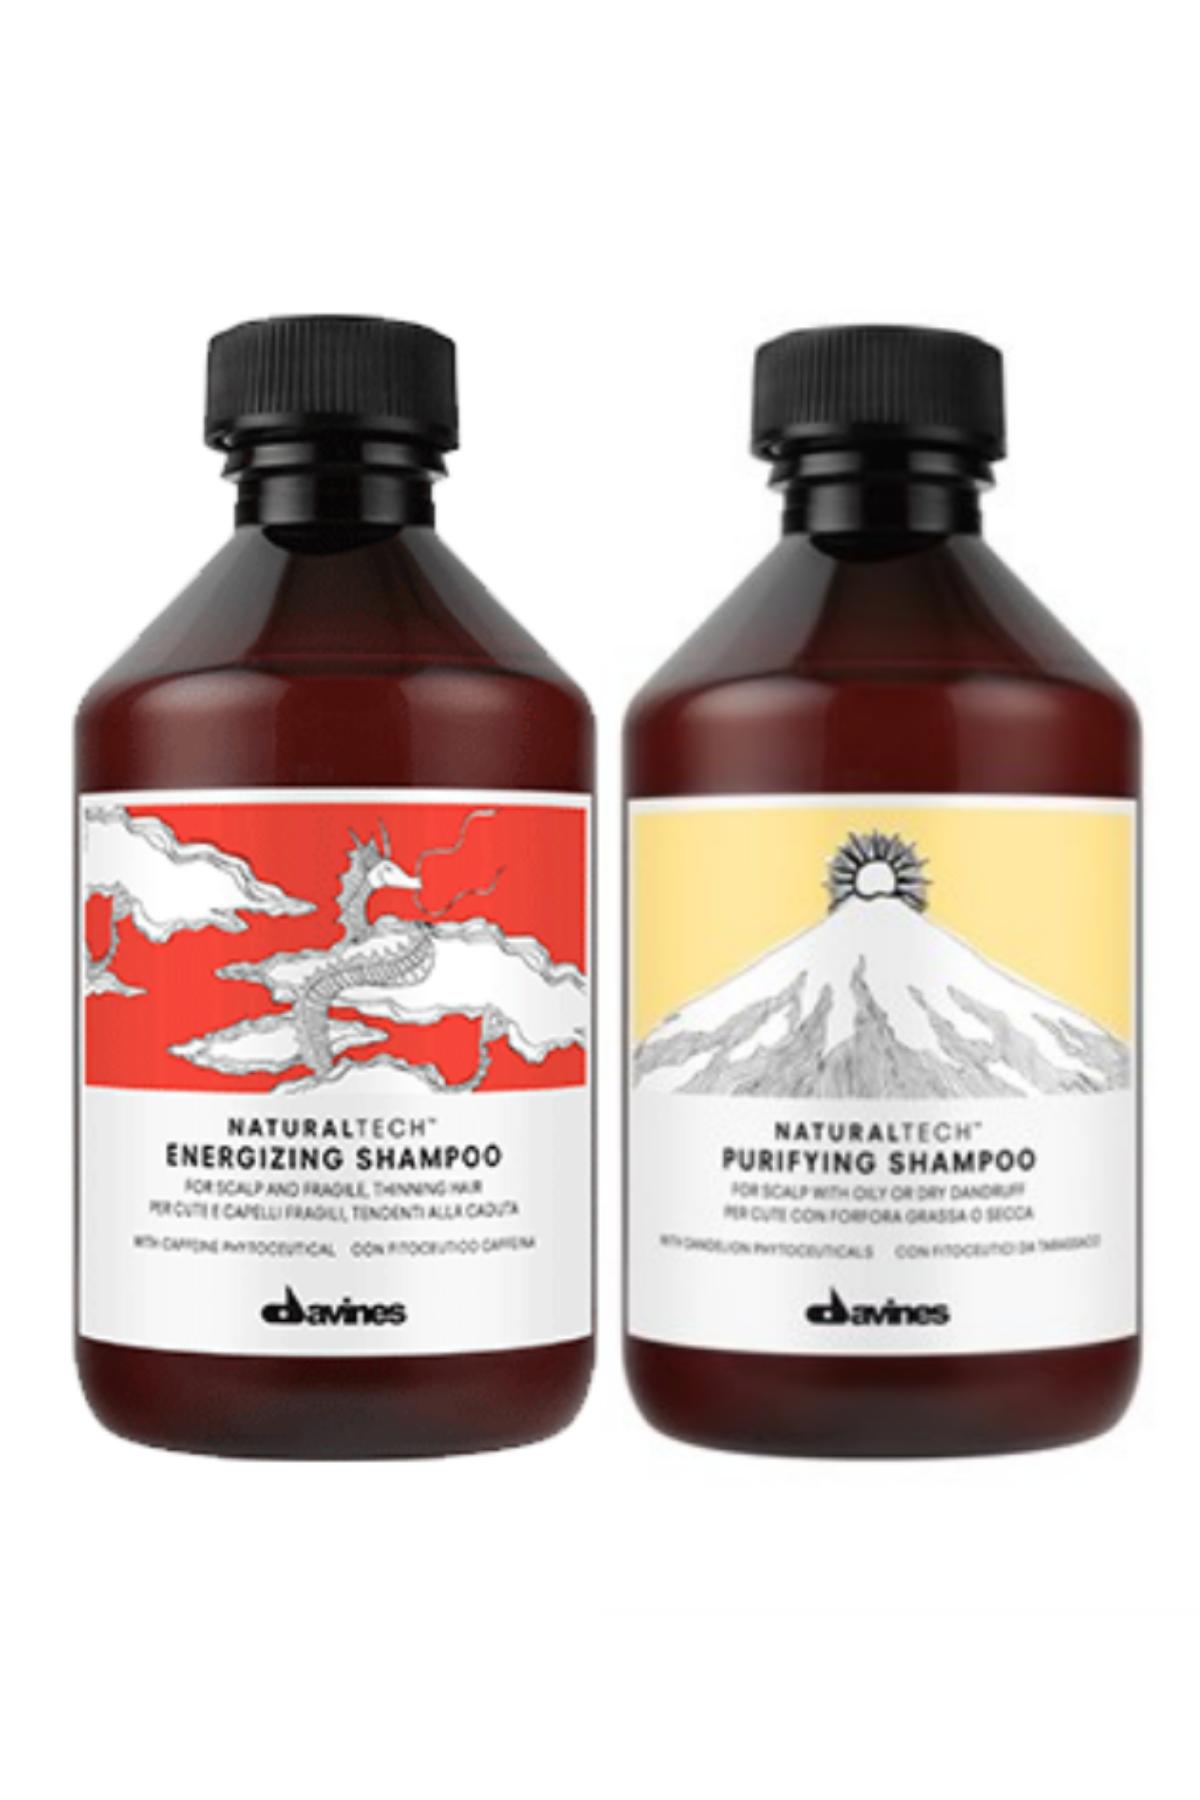 Davines Energizing Şampuan 250 ml + Davines Purifying Şampuan 250 ml